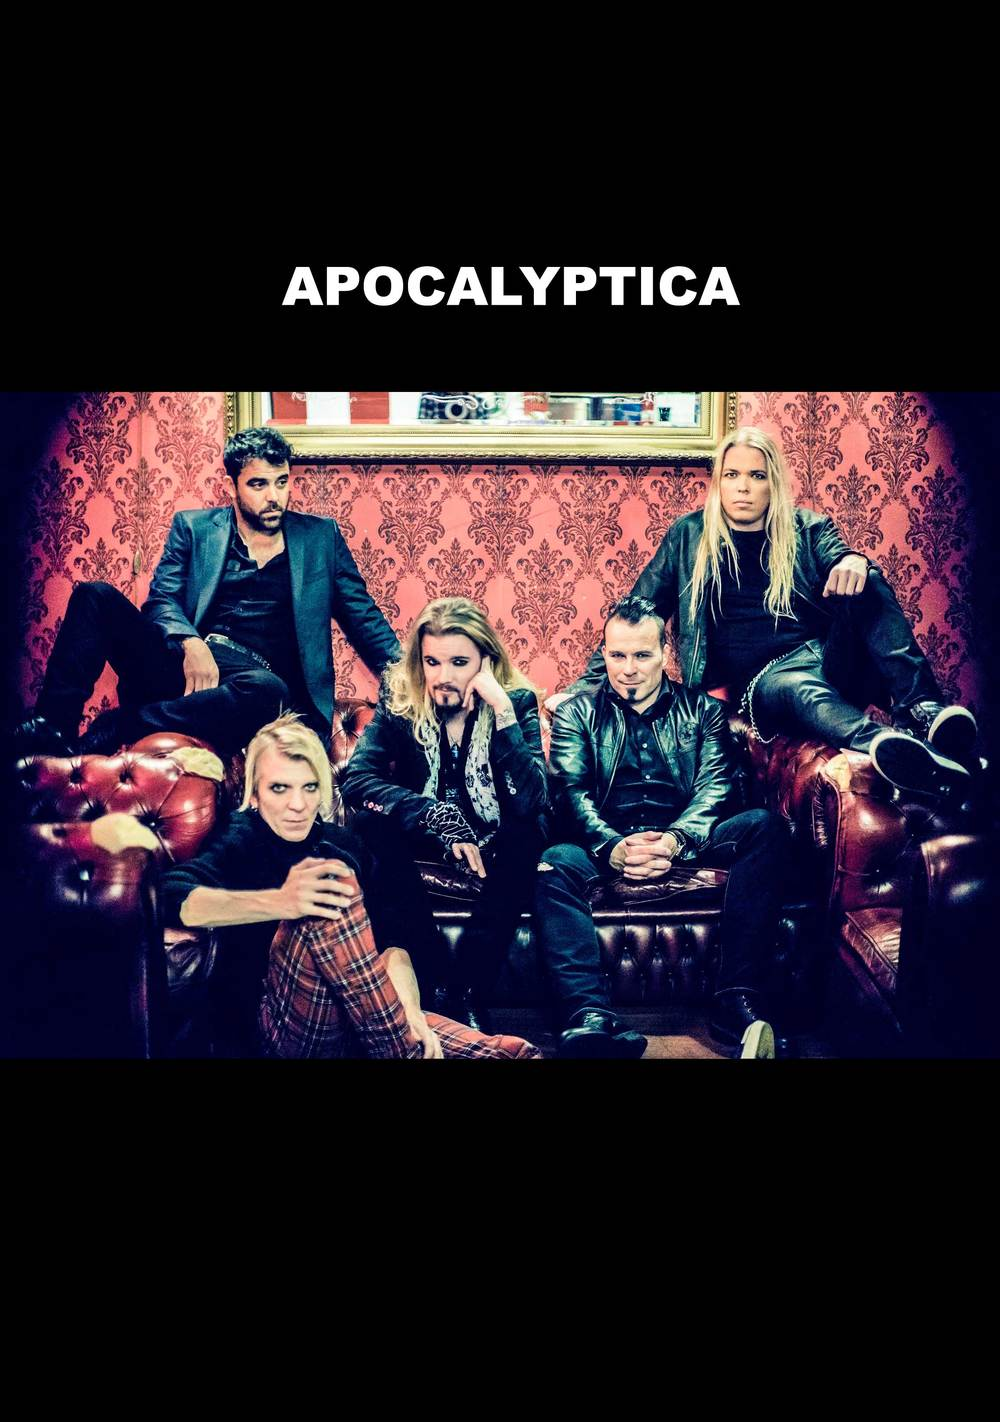 Apocalyptica-poster22.jpg